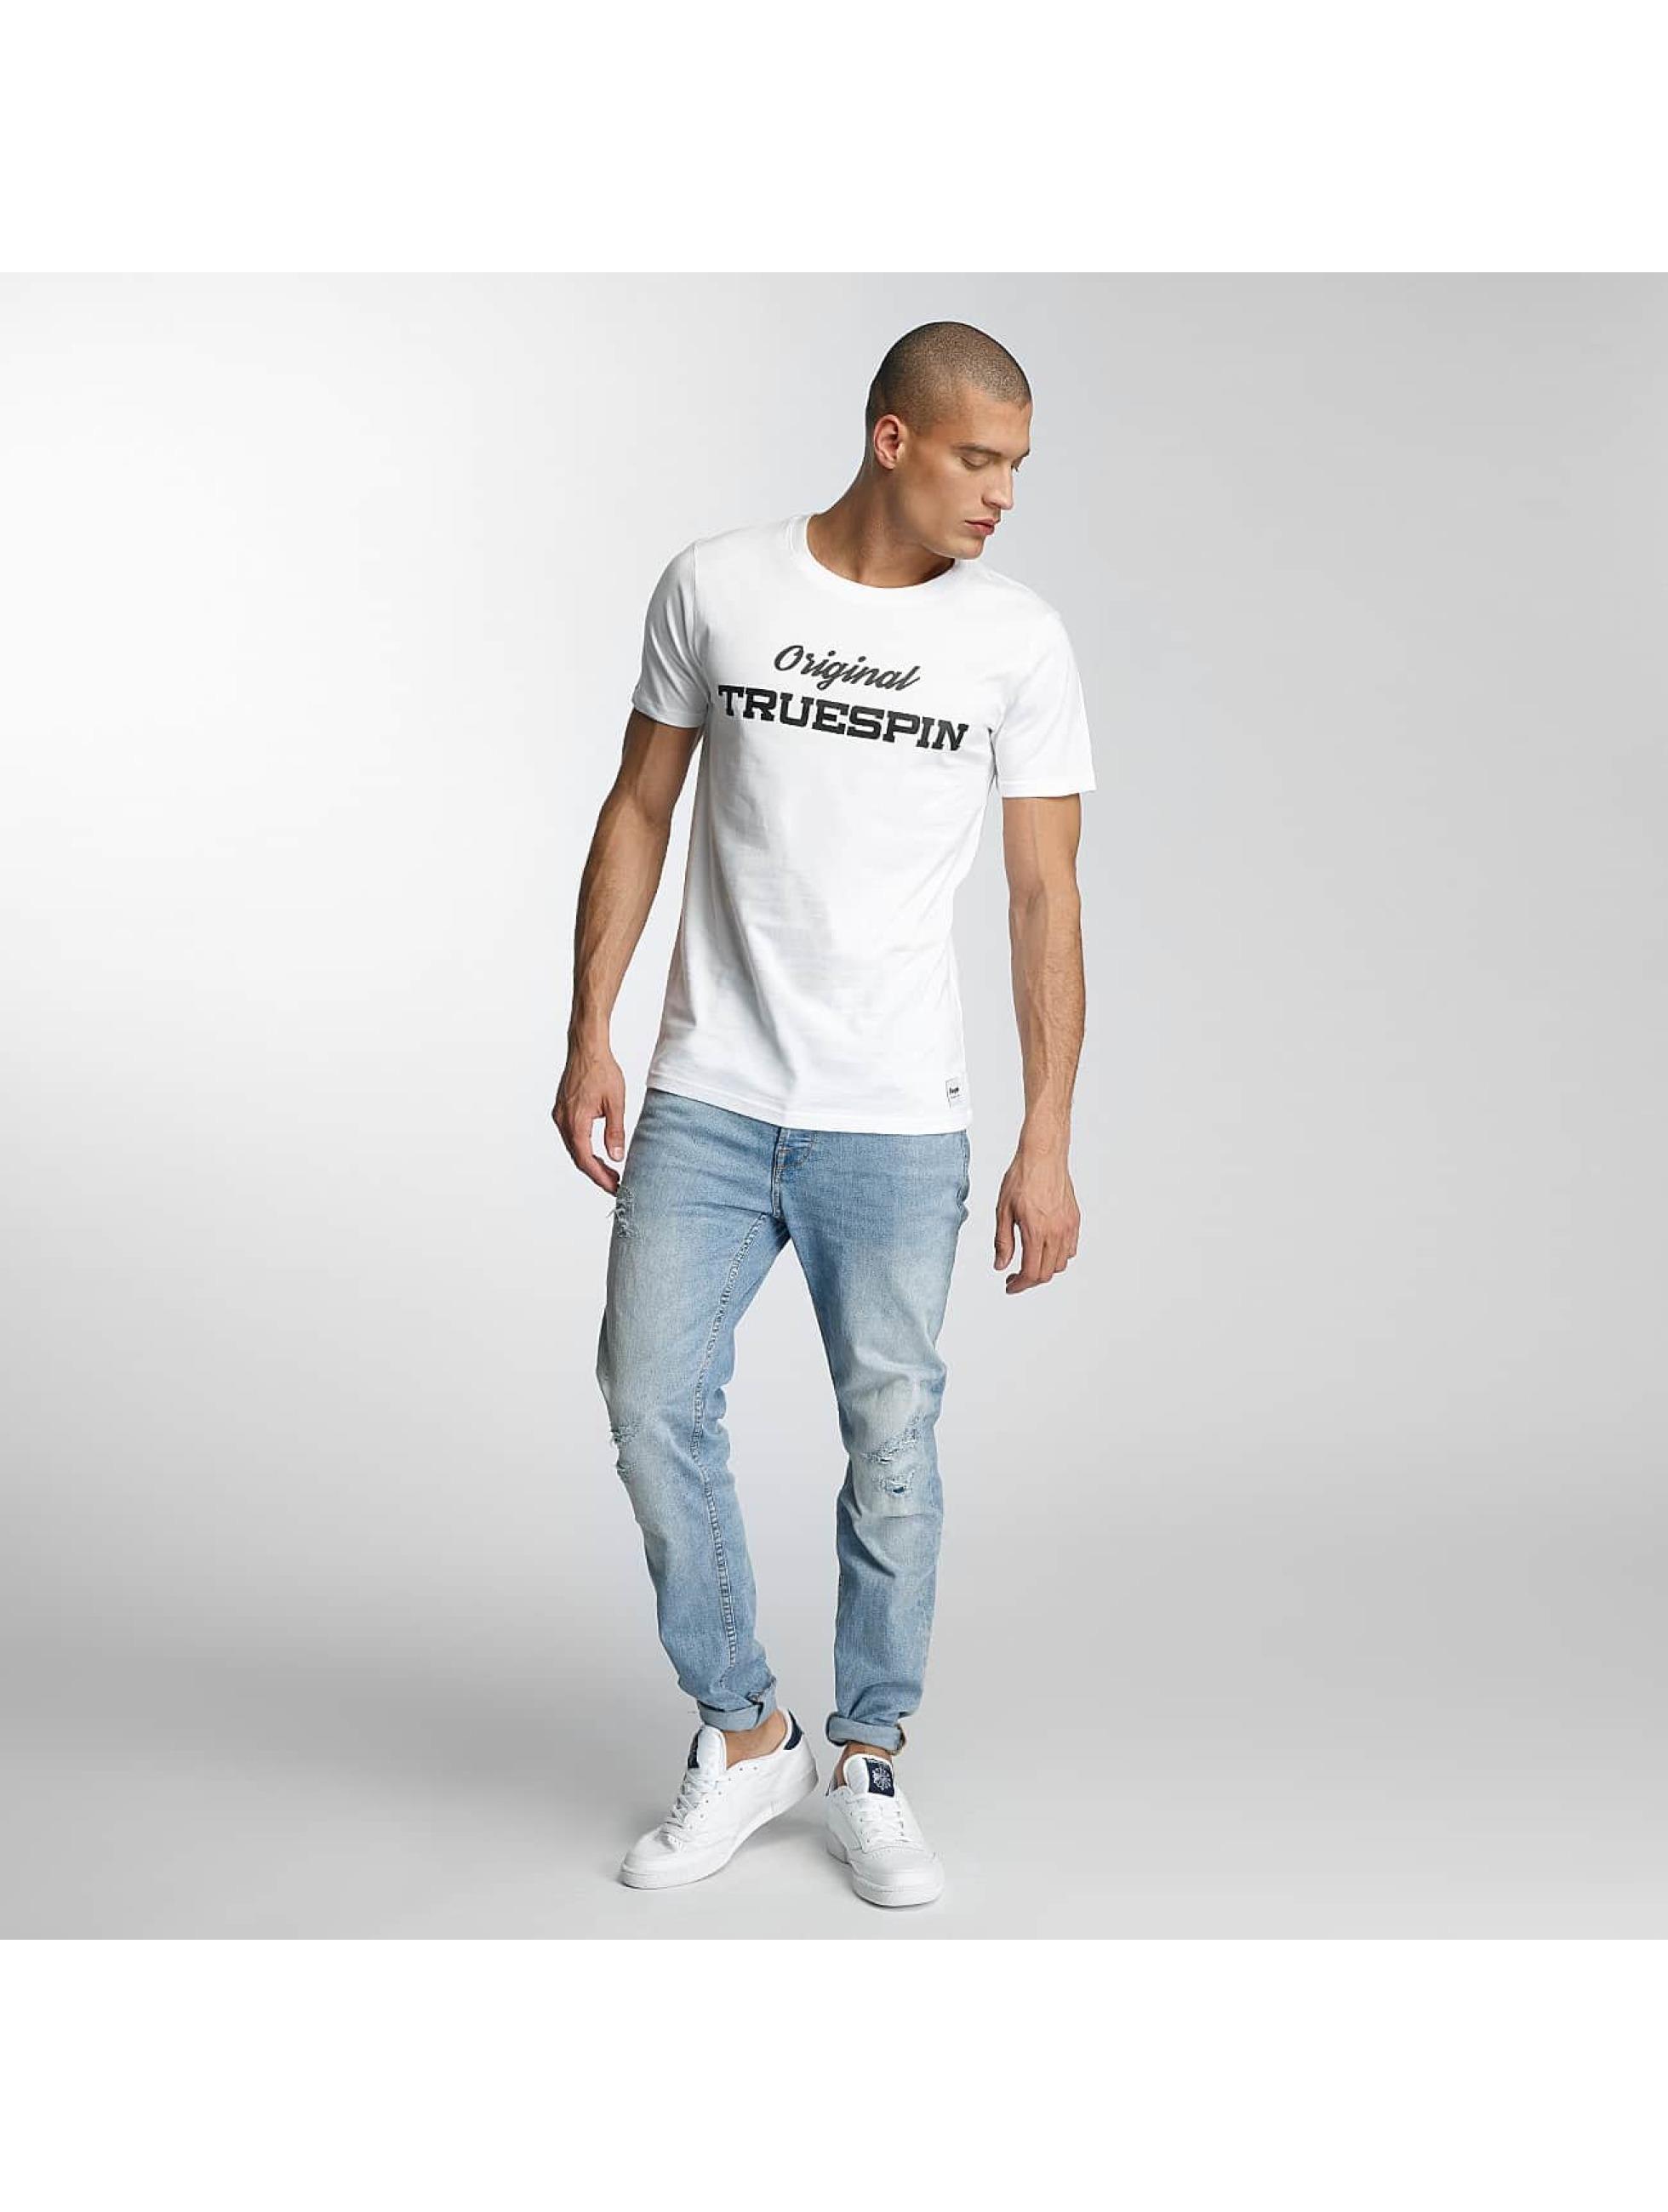 TrueSpin T-Shirt 3 blanc